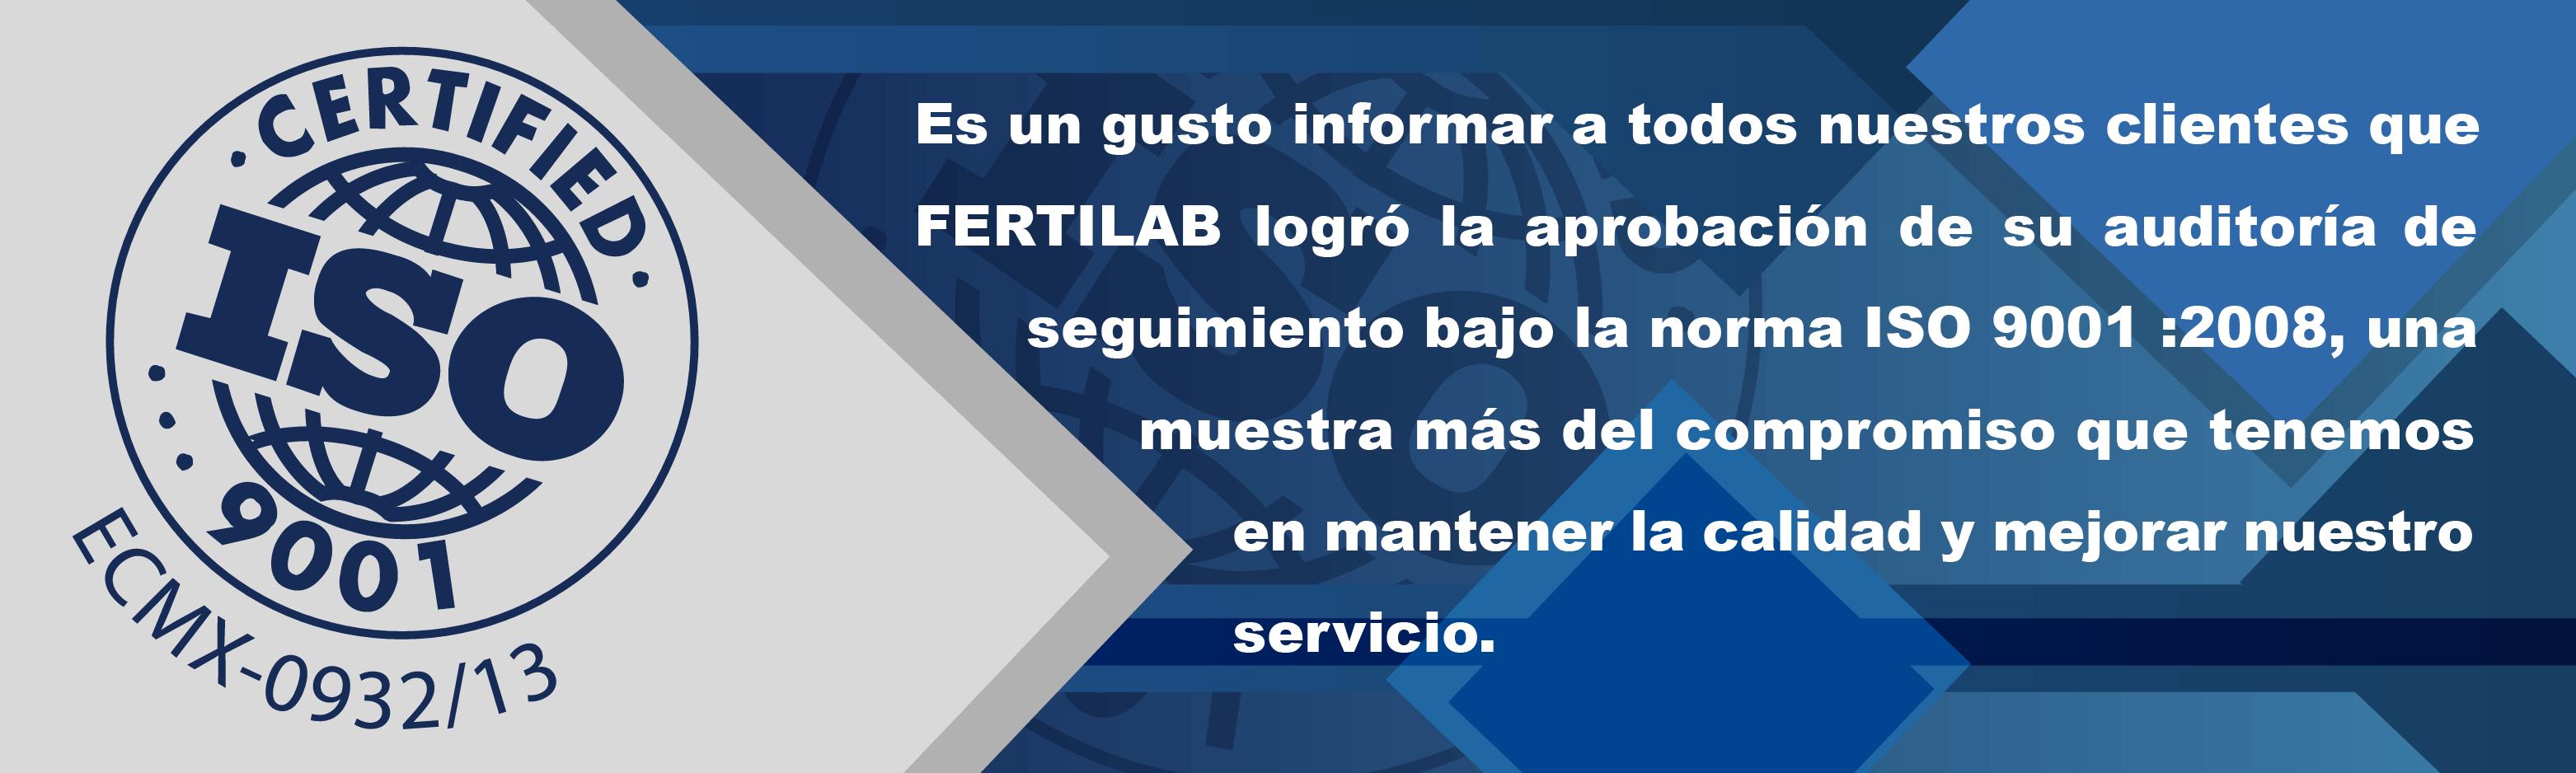 certificacion-ISO-Fertilab